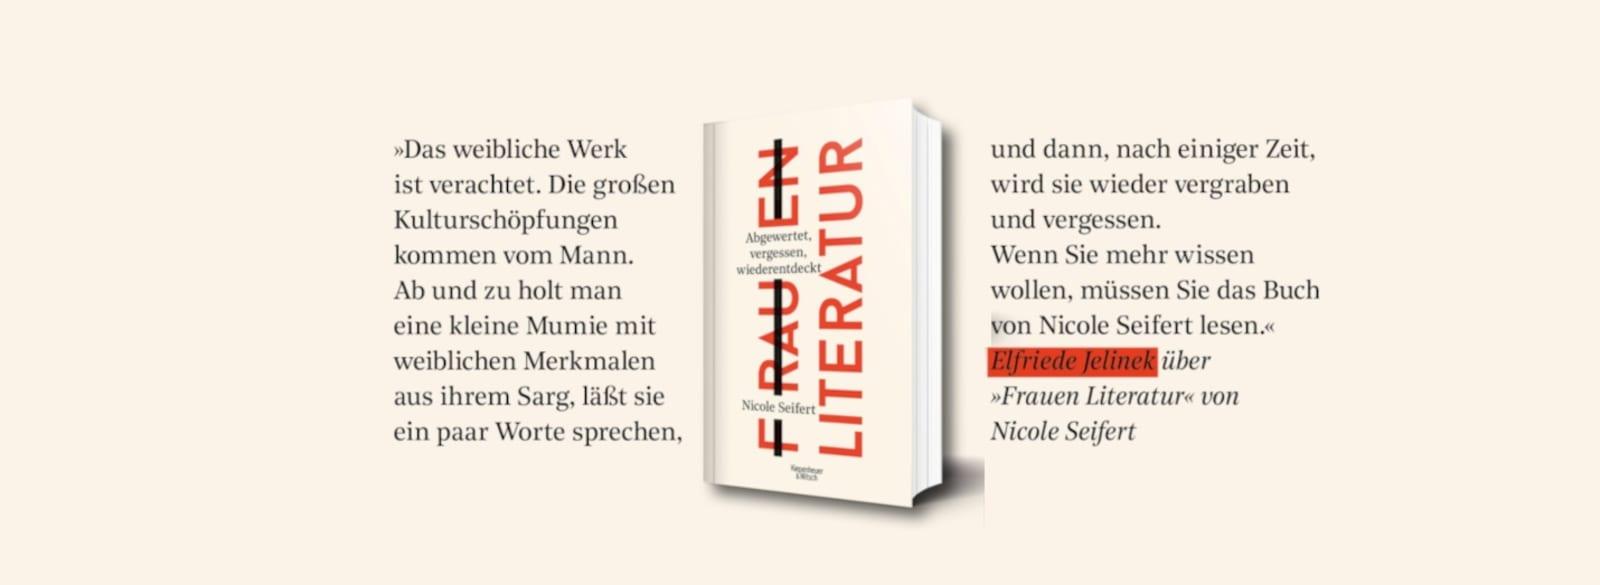 banner_seifert_-_frauen_literatur1440x590.jpg